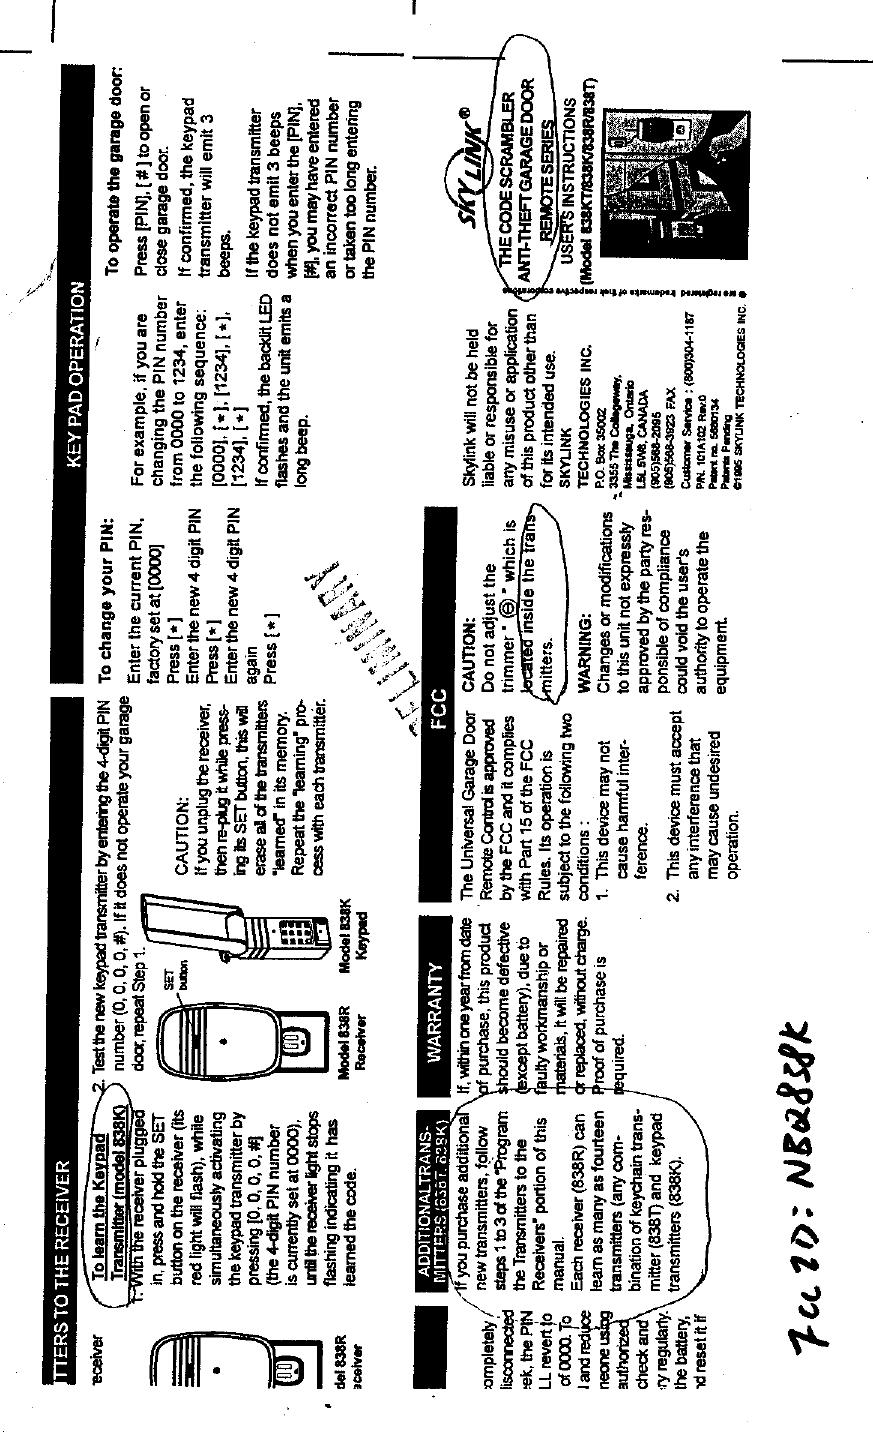 Secure Pro 838K Keypad Transmitter User Manual